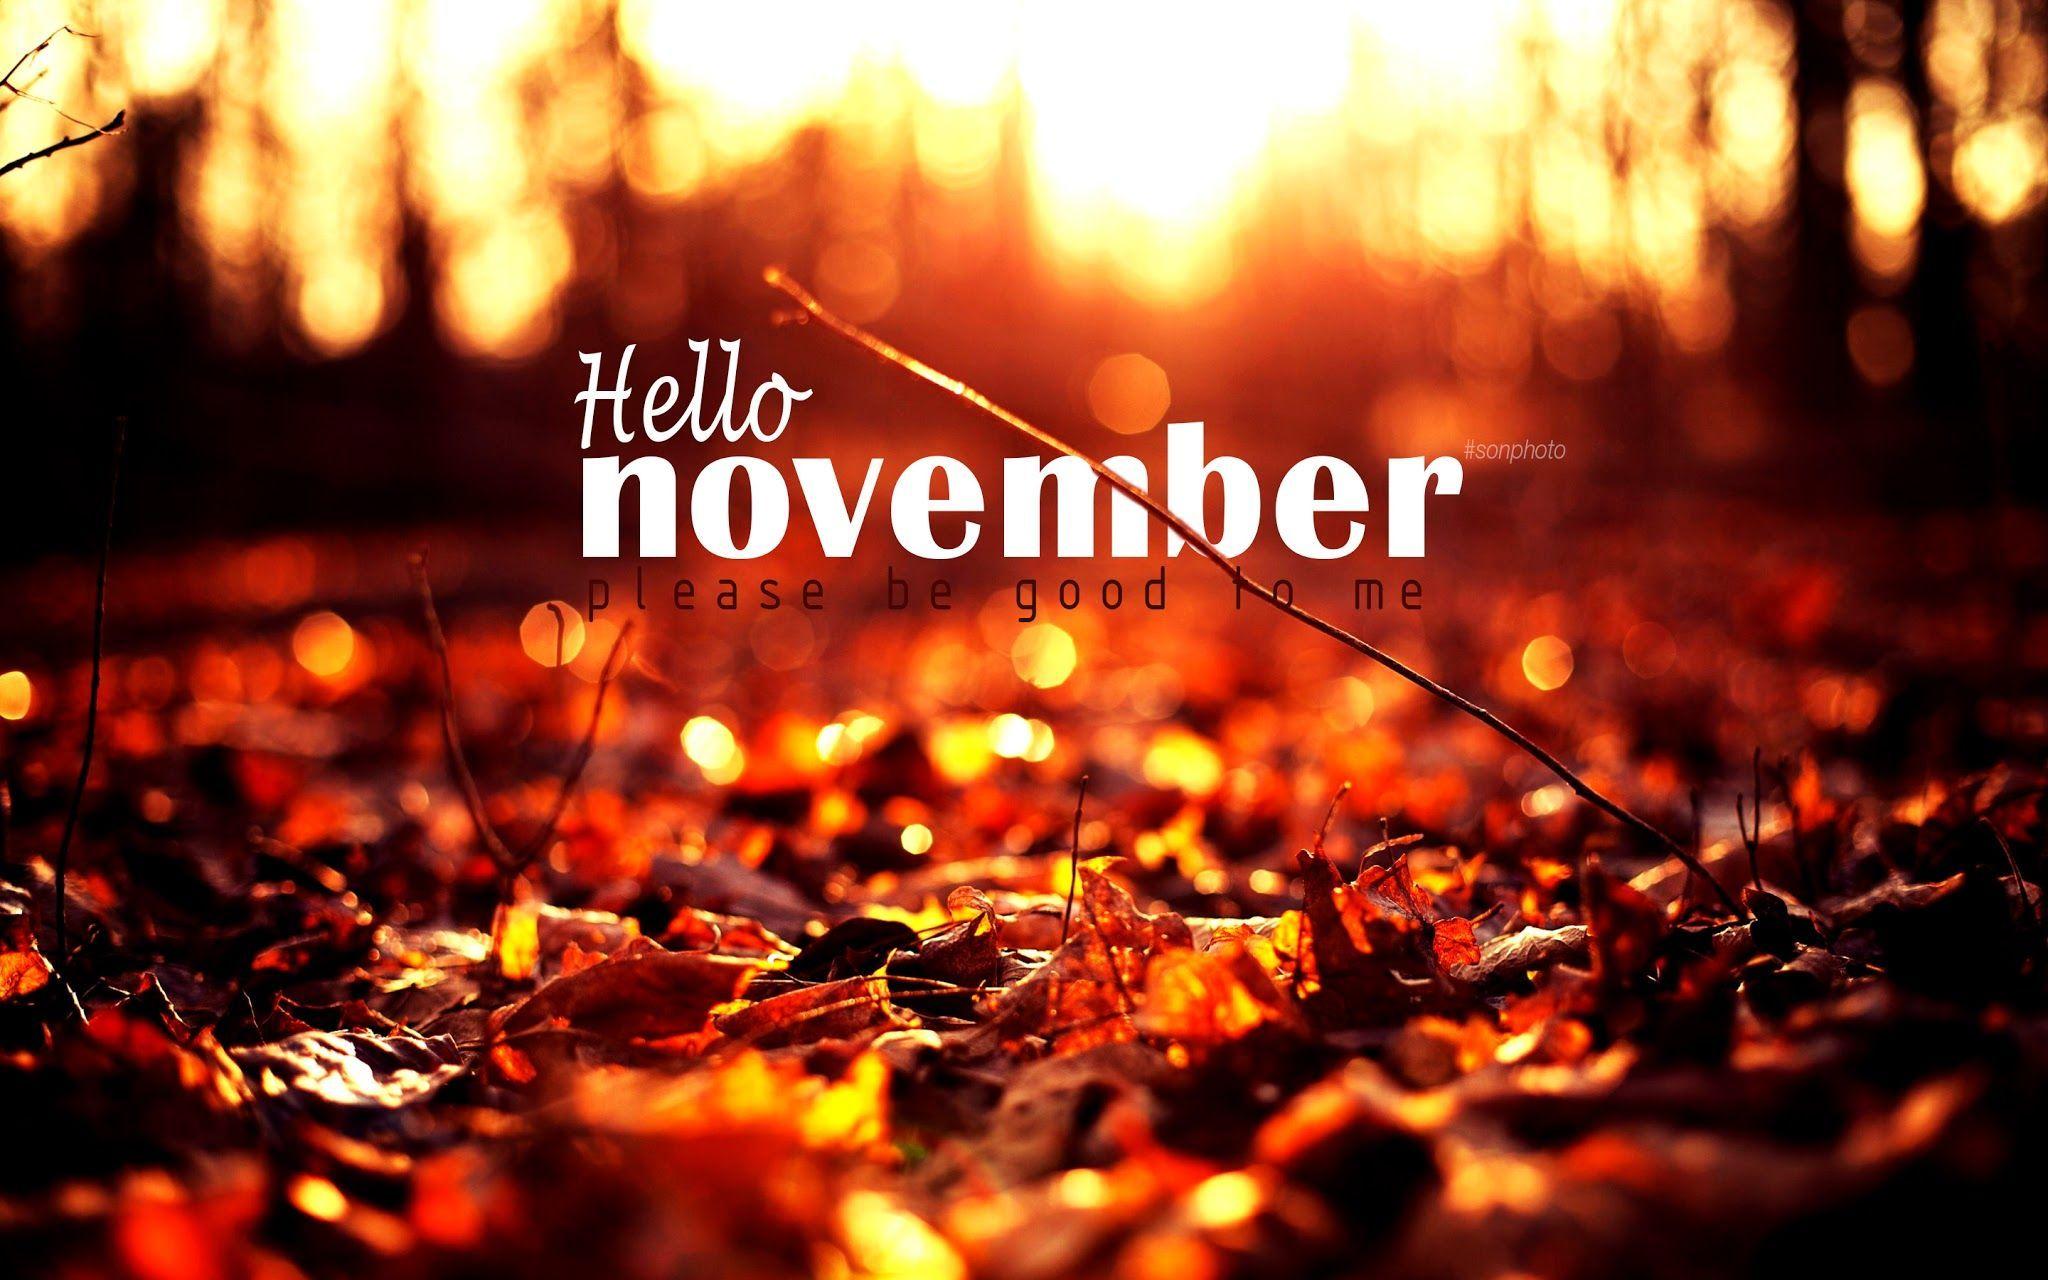 Привет ноябрь картинки (16)